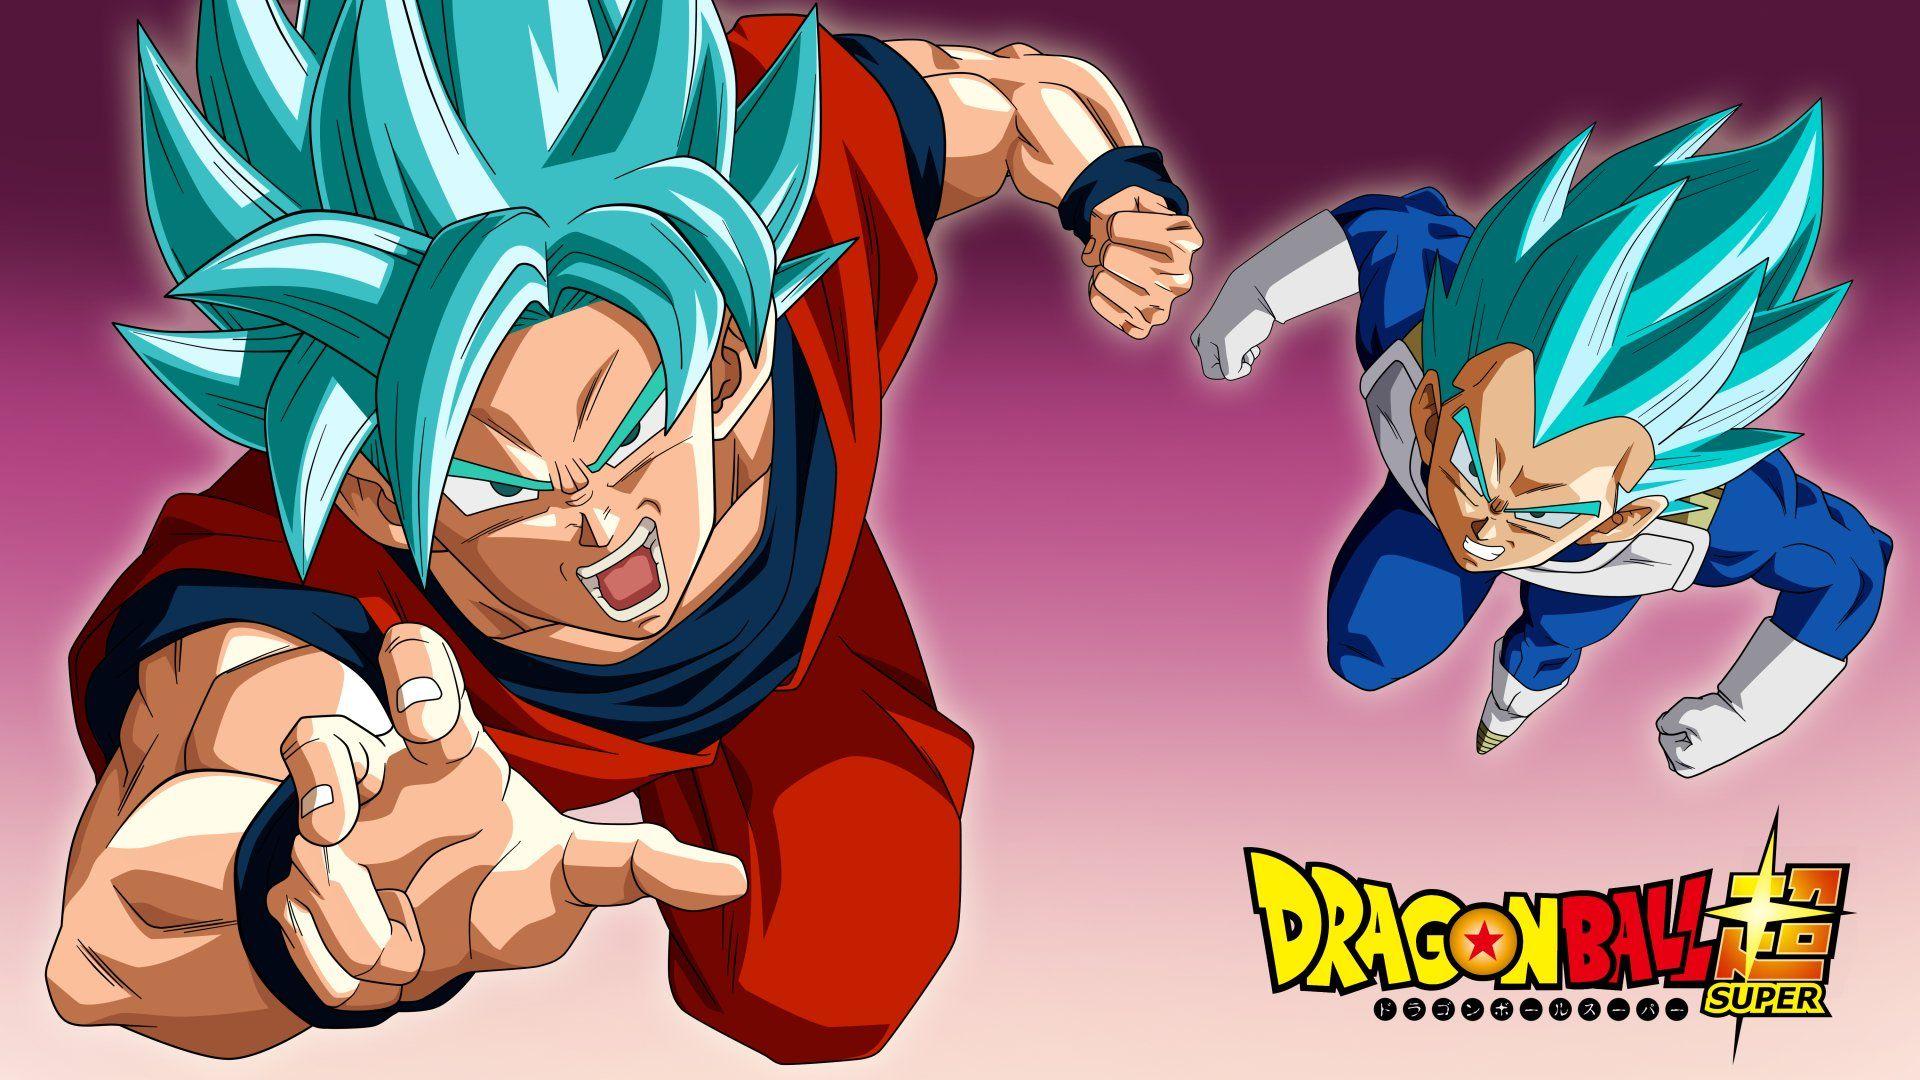 Dragon Ball Super Goku And Vegeta 1920x1080 Download Hd Wallpaper Wallpapertip